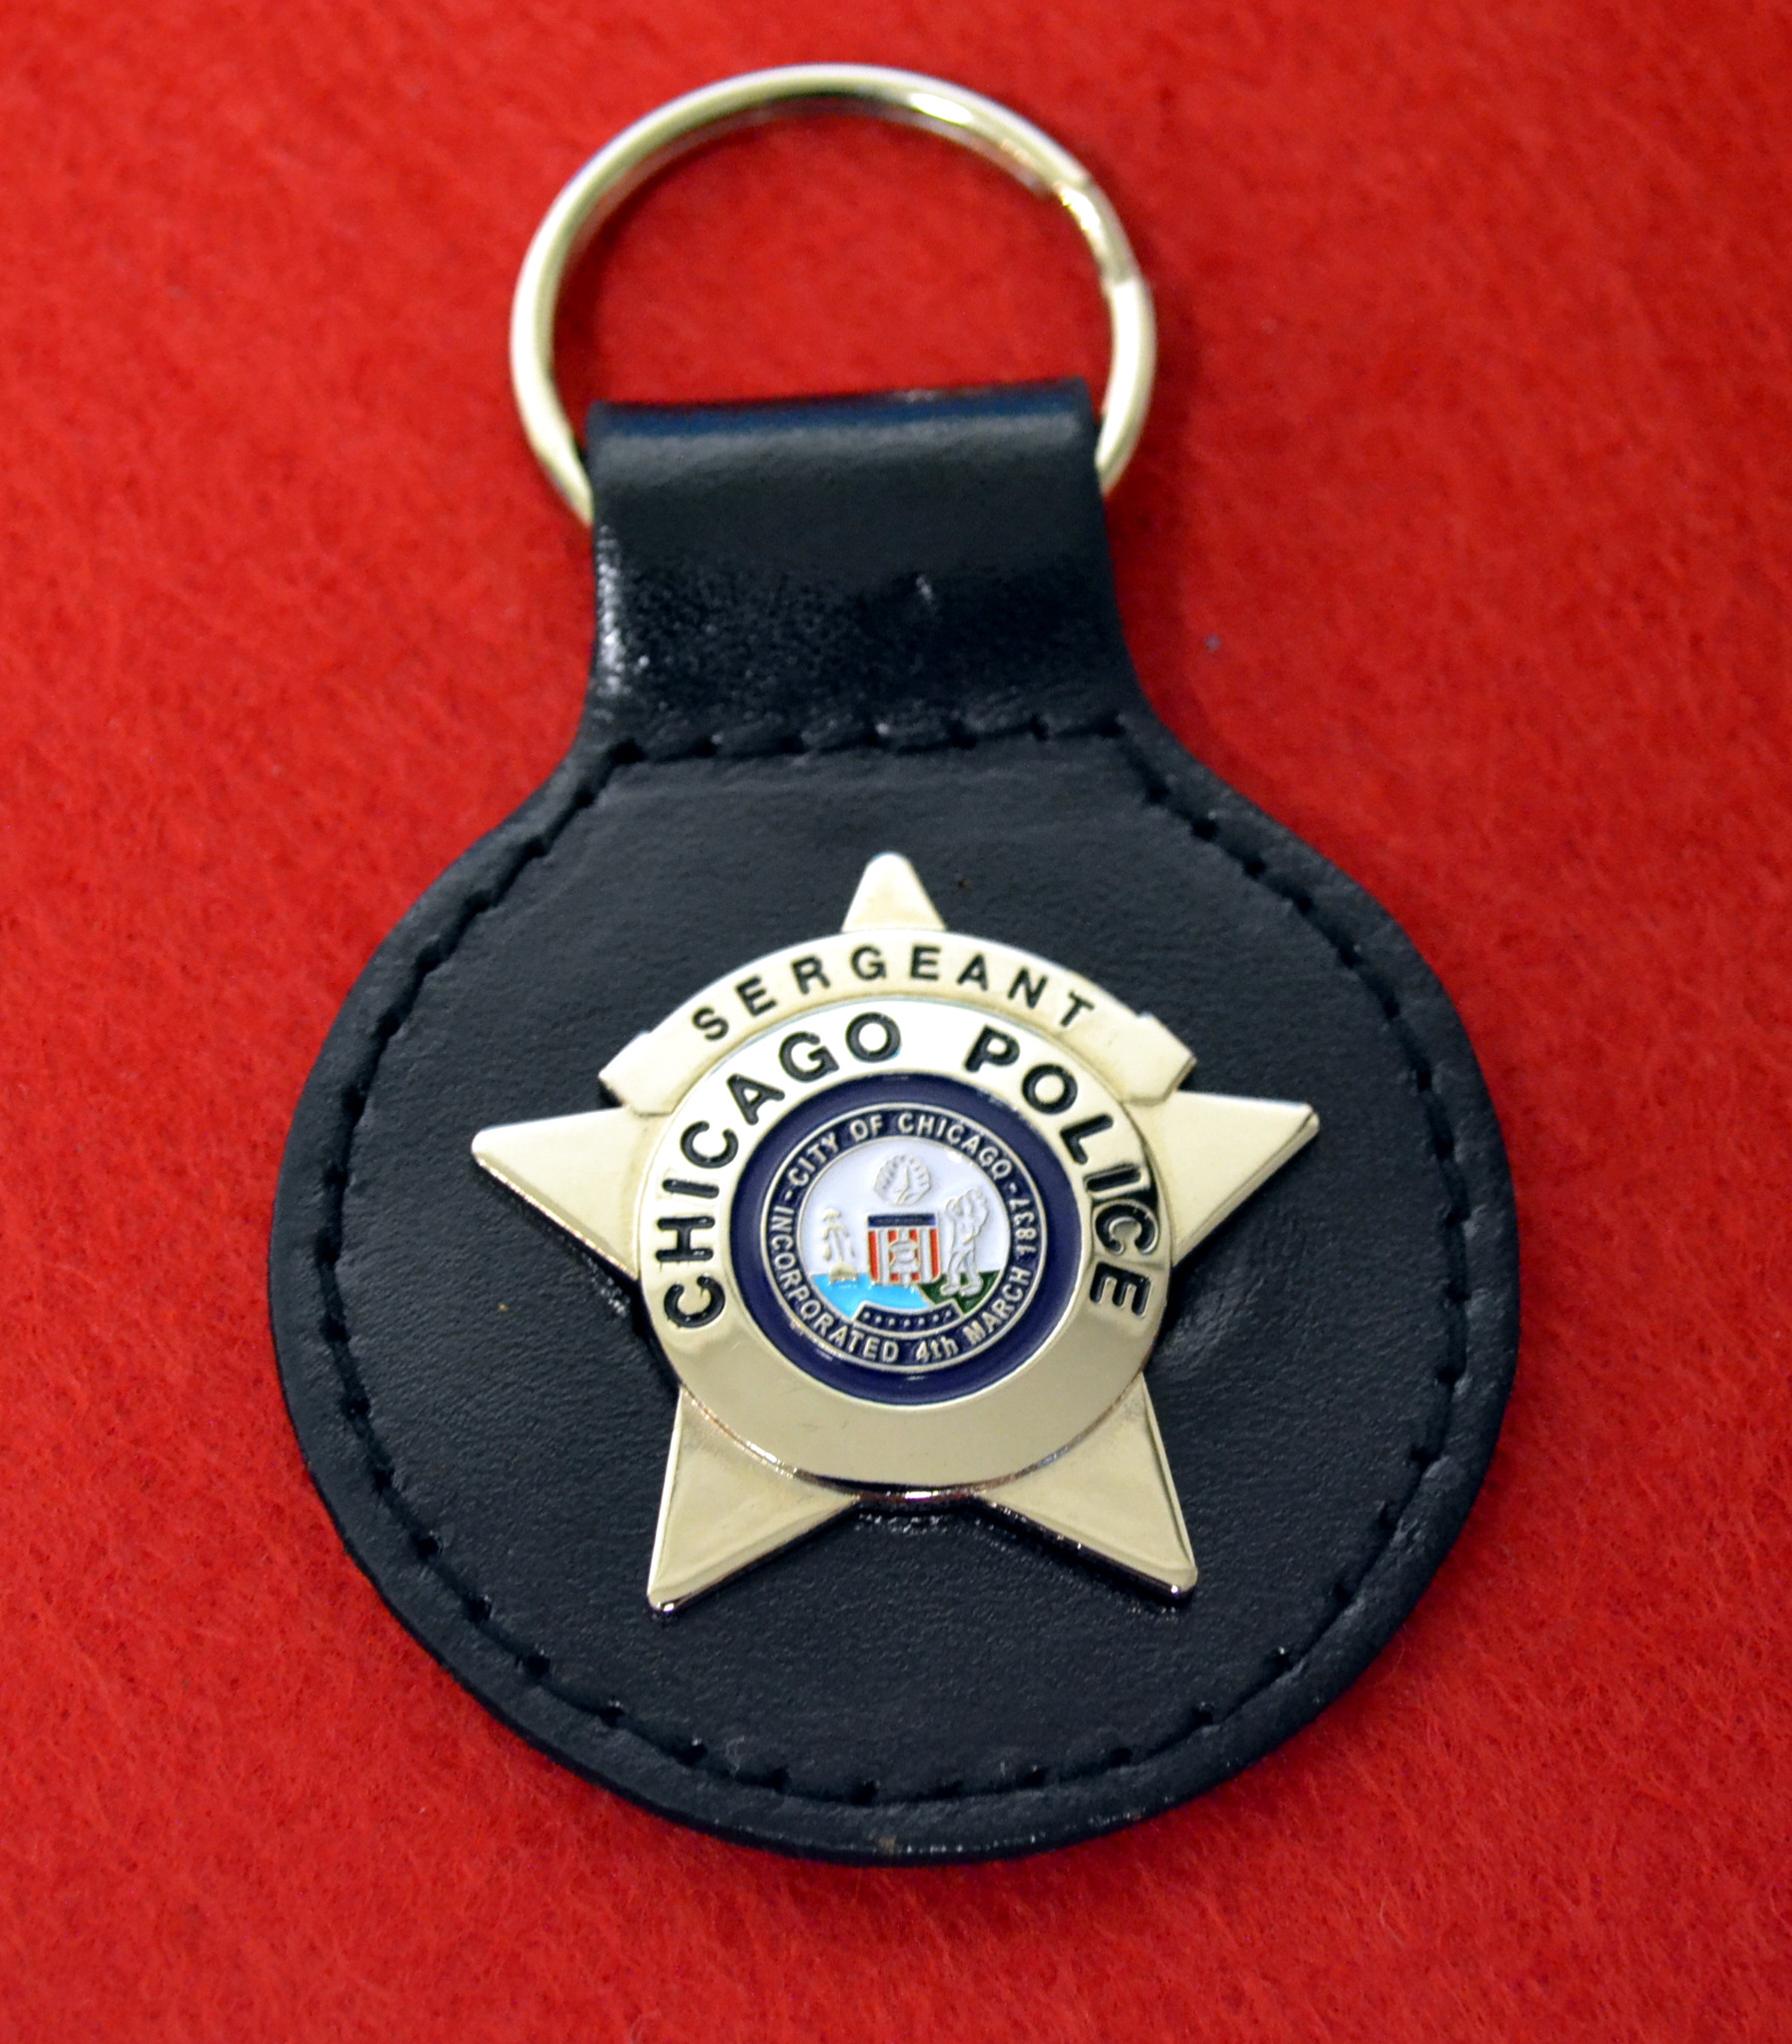 Sergeant Key Fob